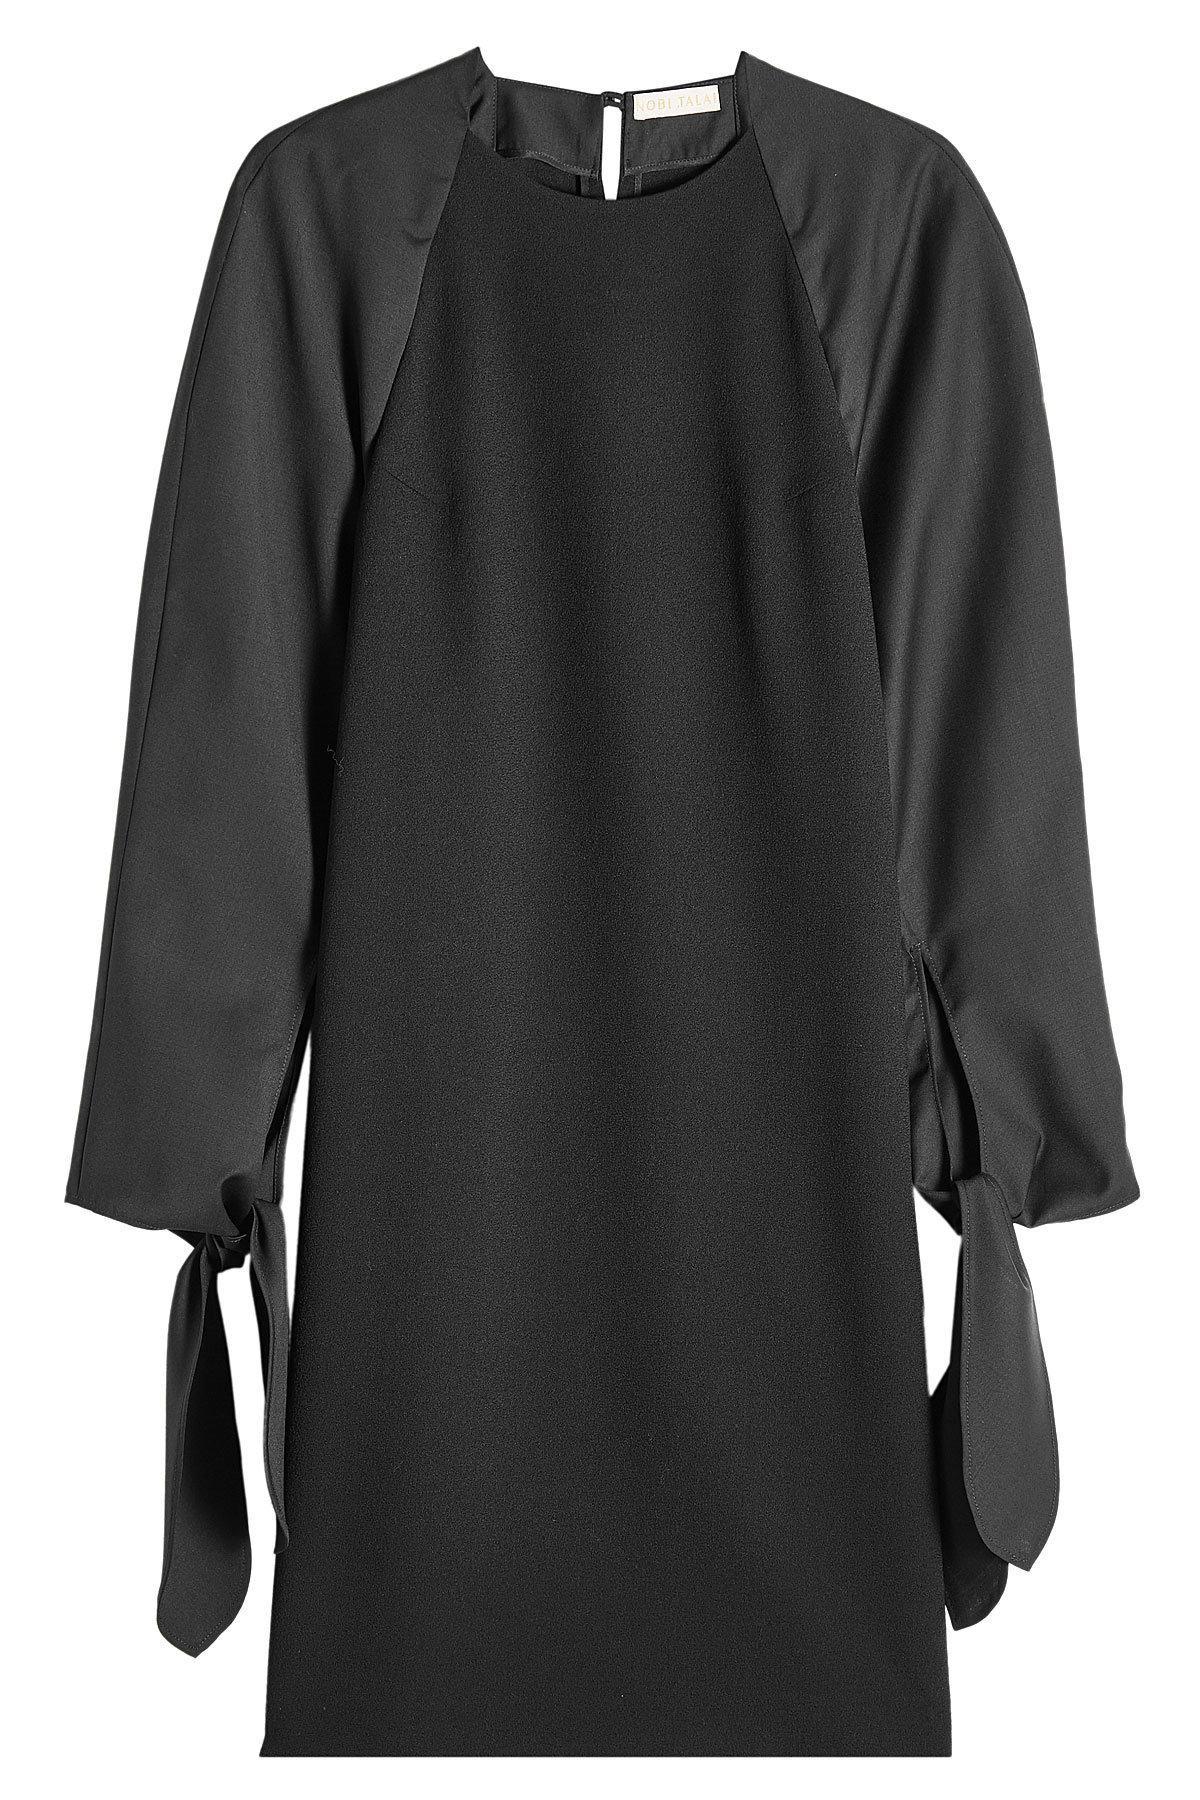 Nobi Talai Virgin Wool Dress With Bows In Black